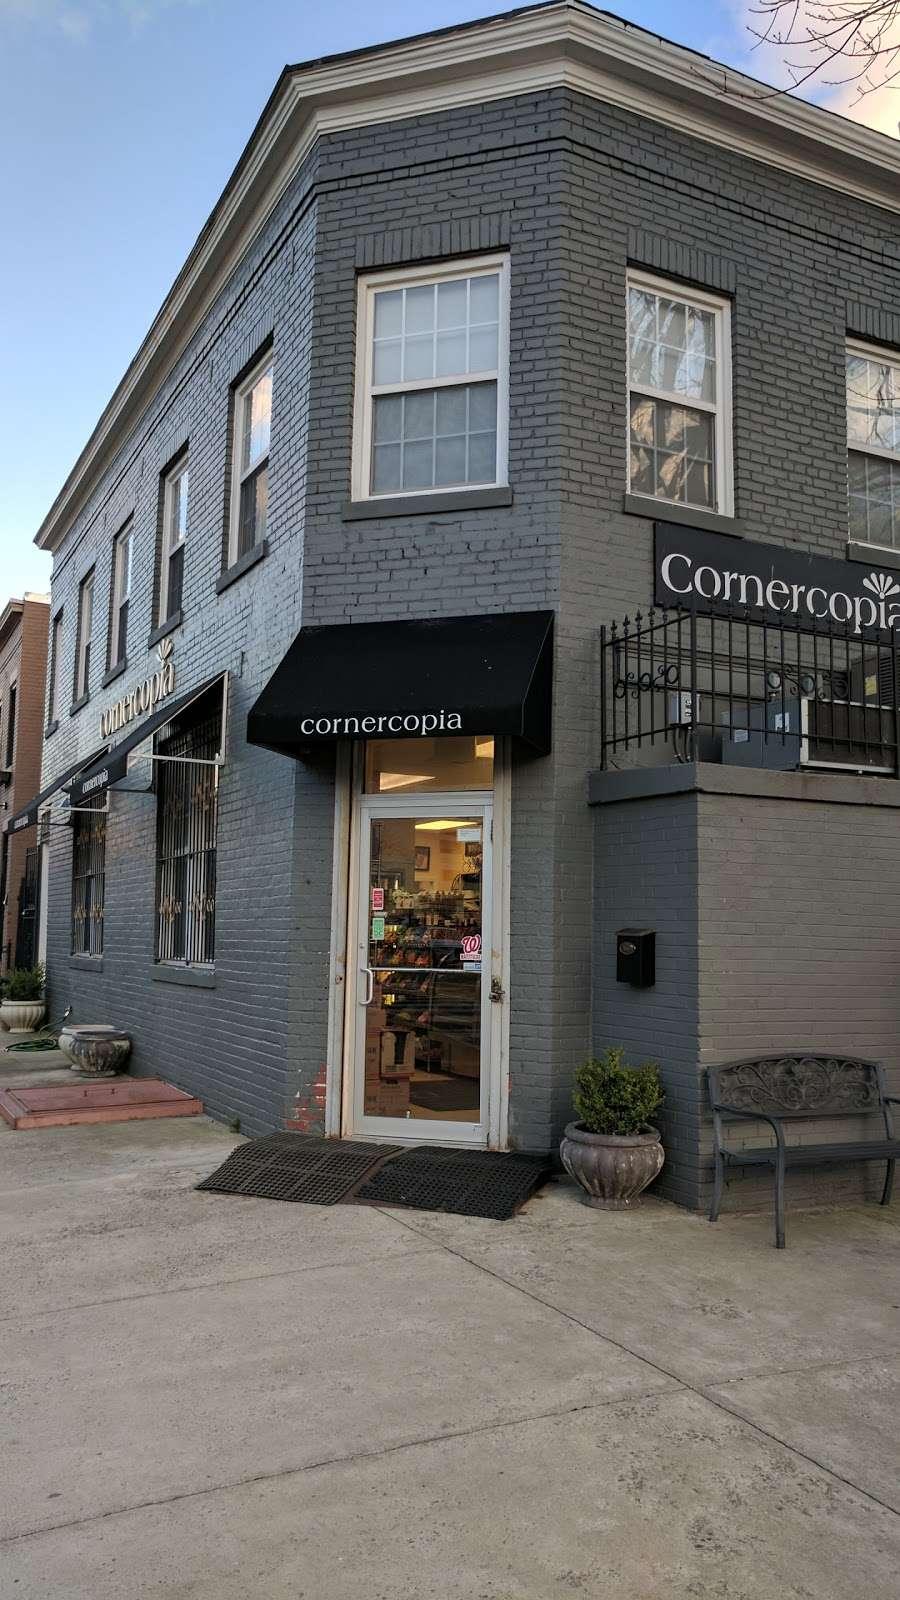 Cornercopia - convenience store  | Photo 9 of 9 | Address: 1000 3rd St SE, Washington, DC 20003, USA | Phone: (202) 525-1653